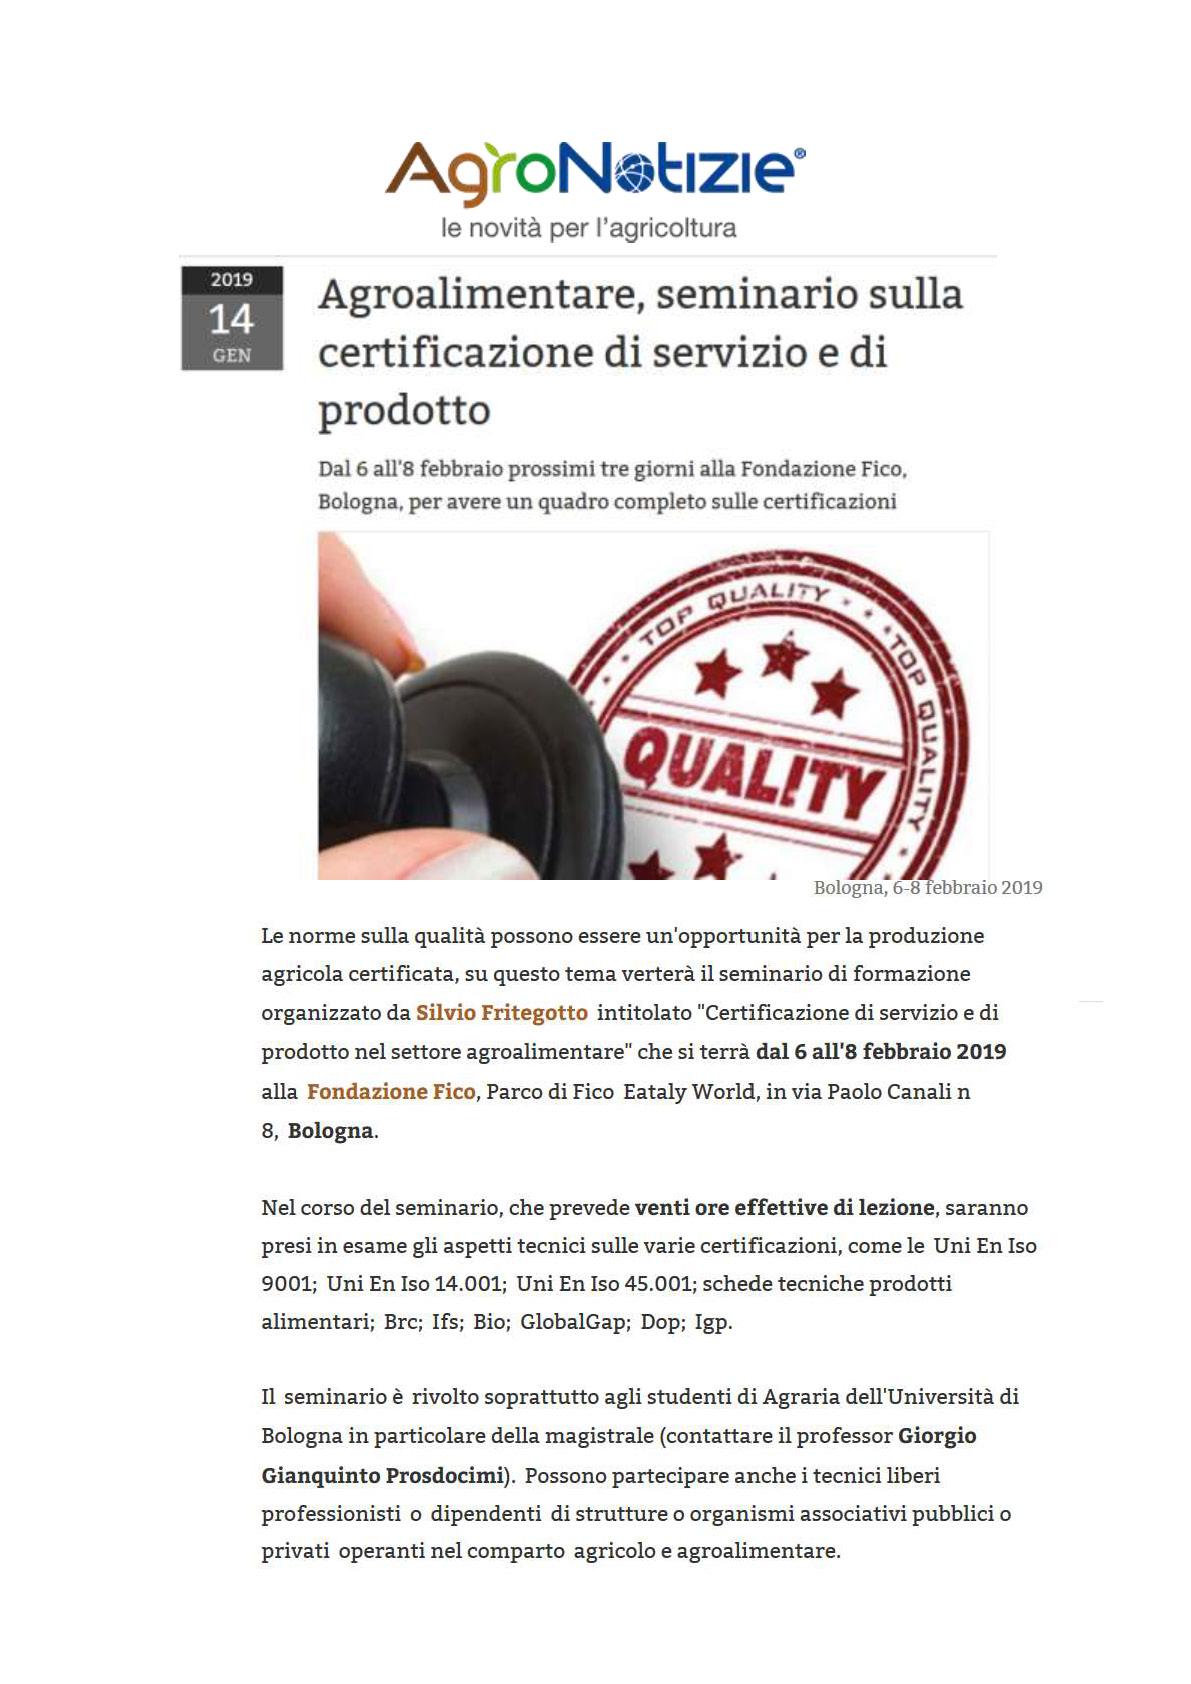 RS-14-gennaio-19-agronotizie-seminario-certificazione